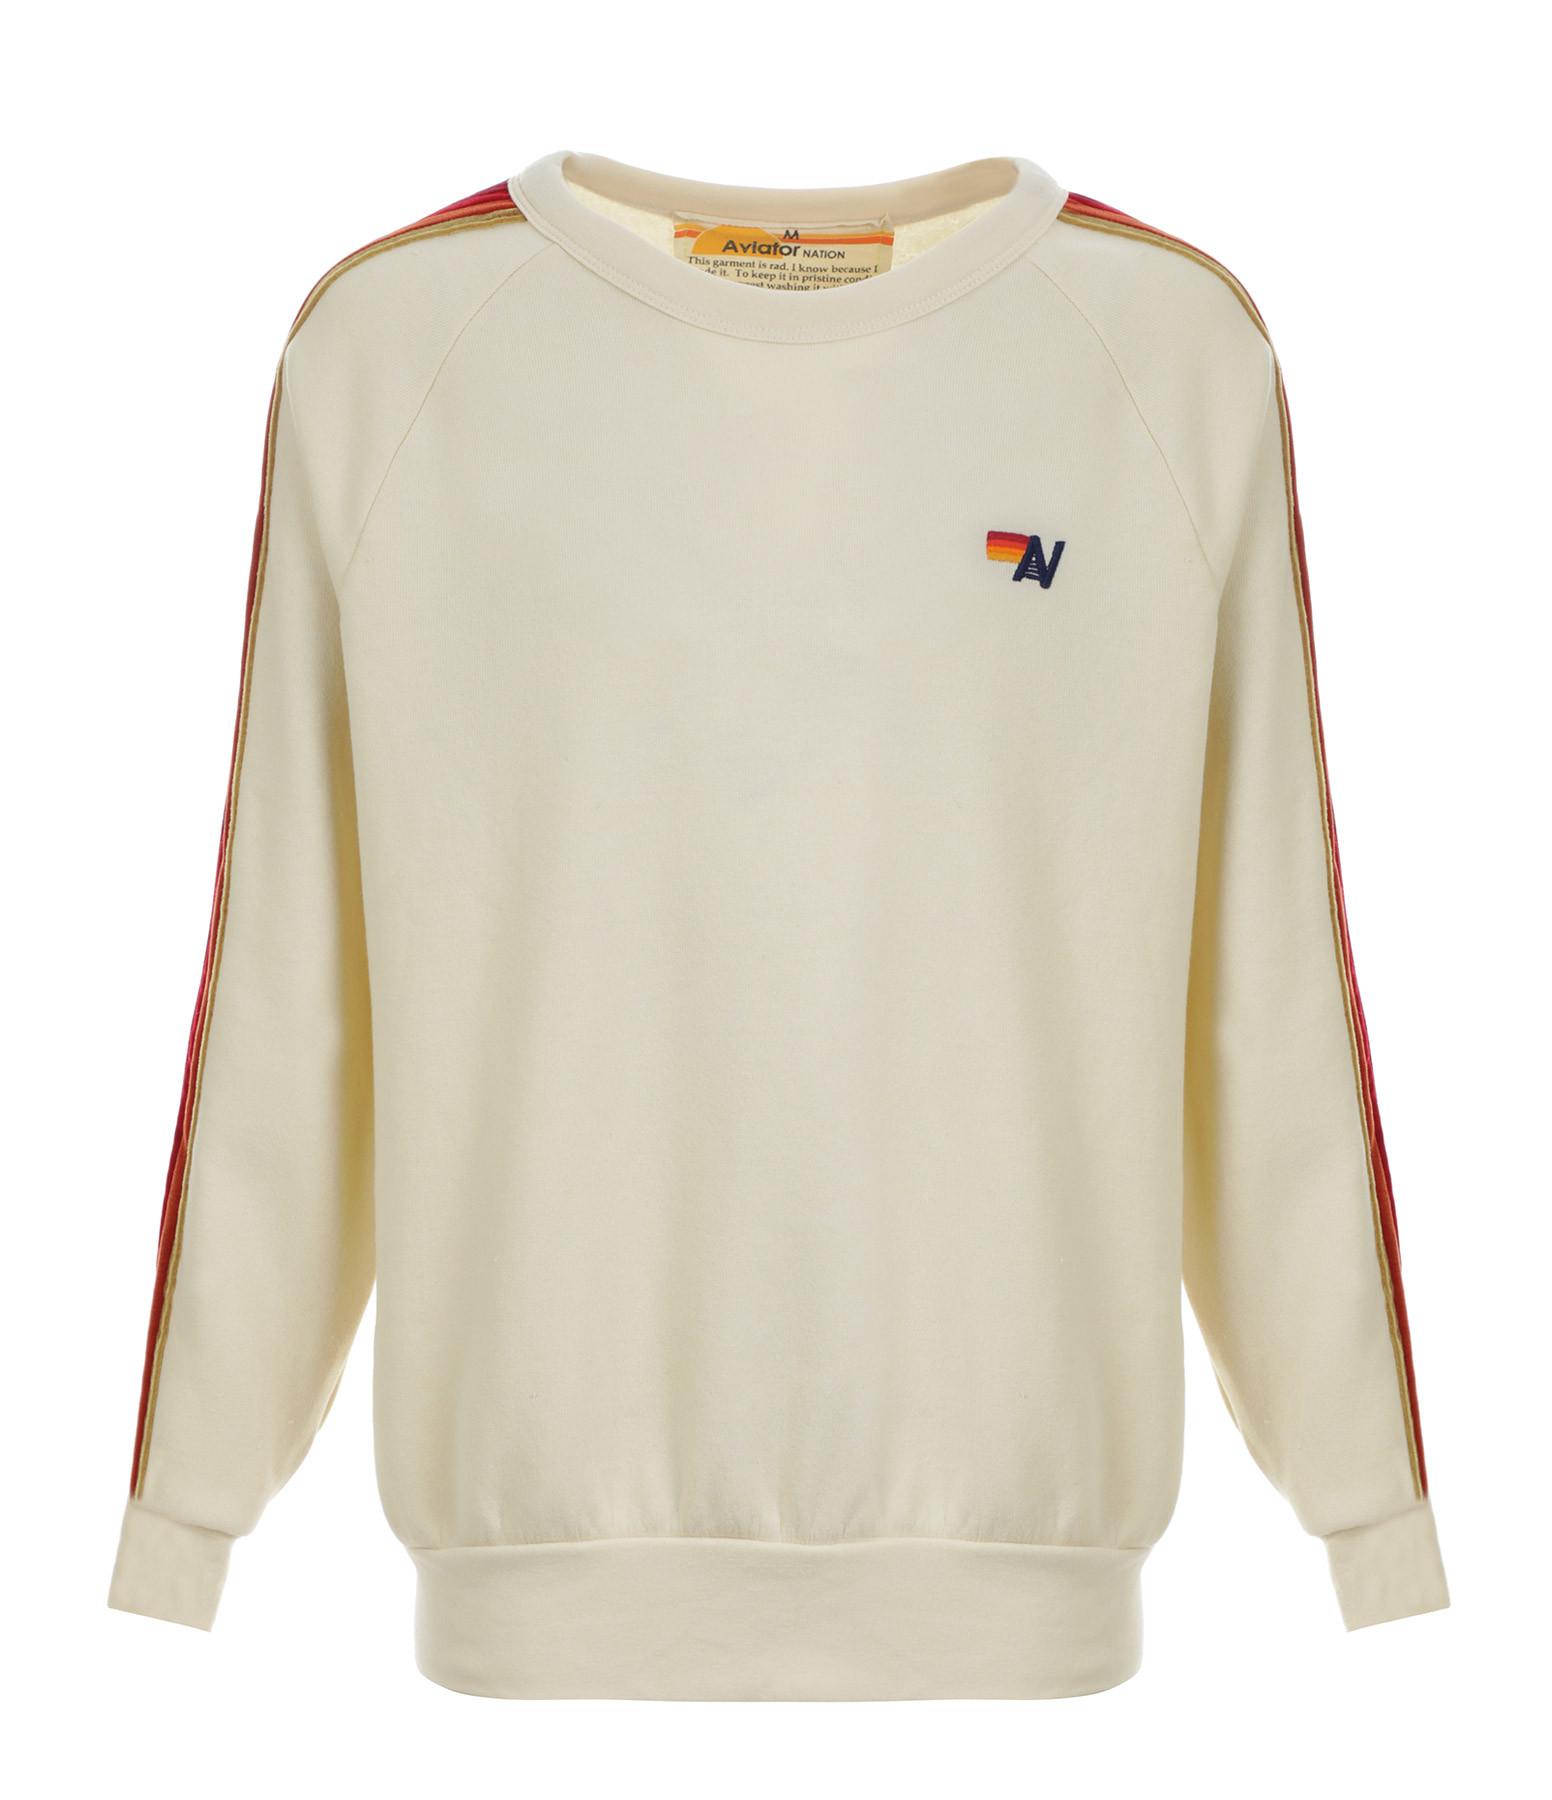 AVIATOR NATION - Sweatshirt Classic Rayures Velours Blanc Vintage